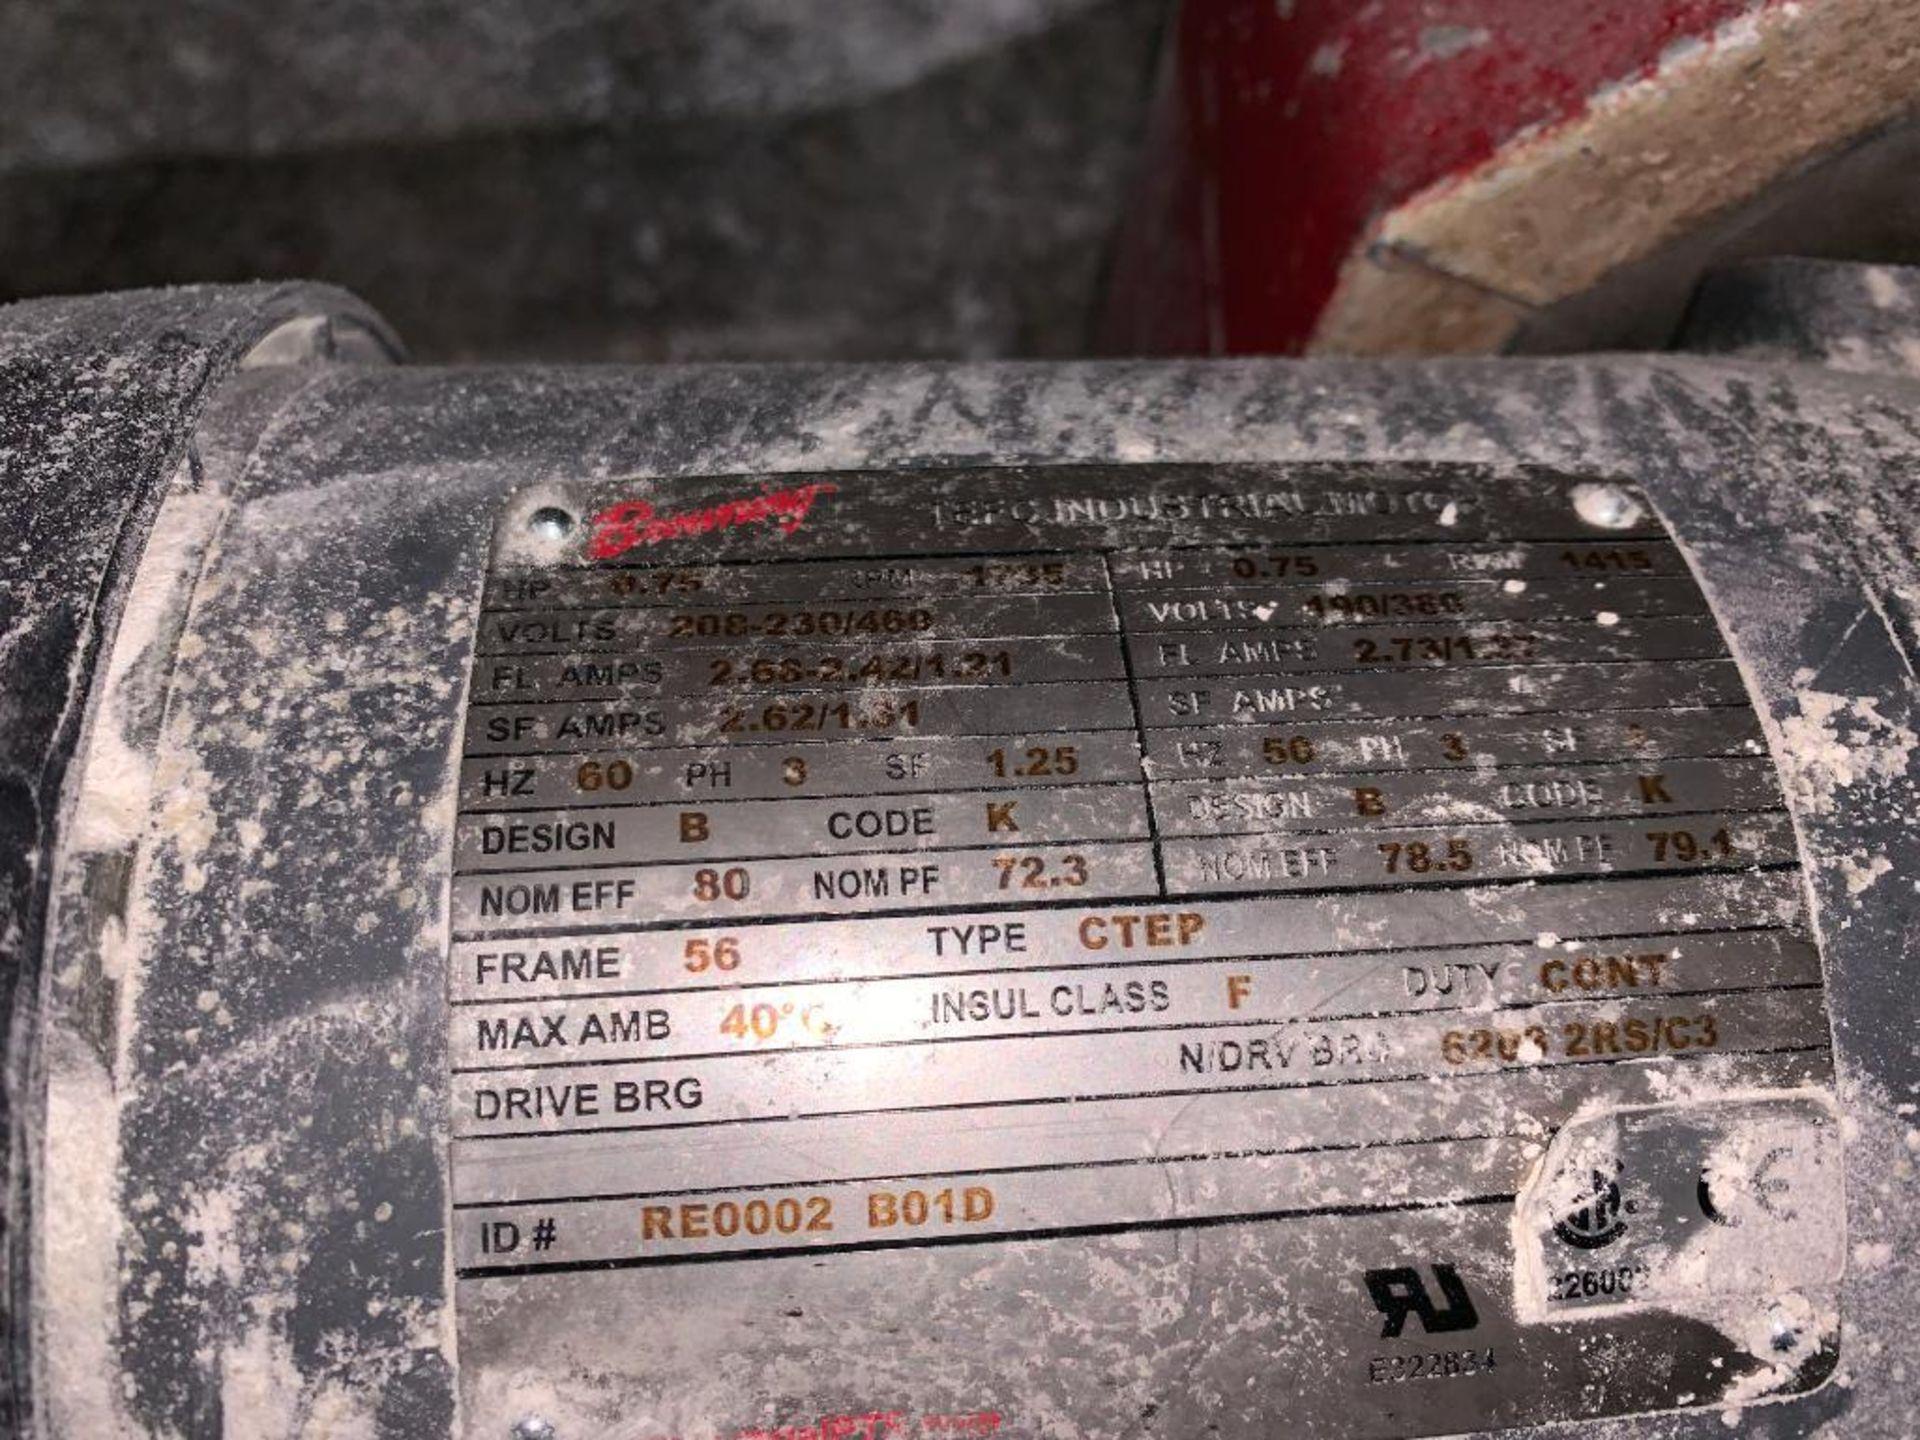 Sweco vibratory sifter - Image 6 of 13